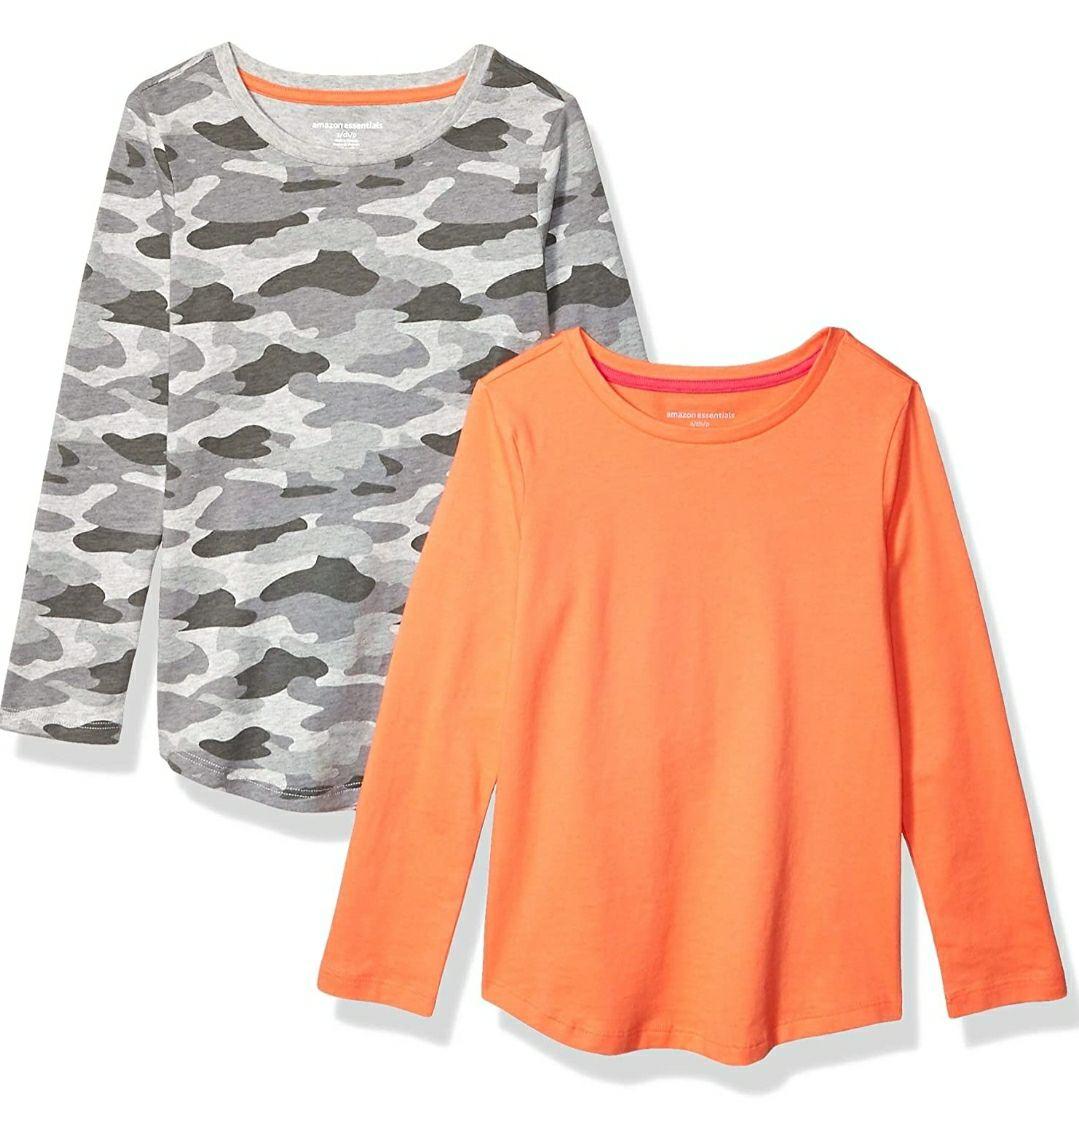 Pack 2 camisetas niñas, manga larga (Talla 8 años)